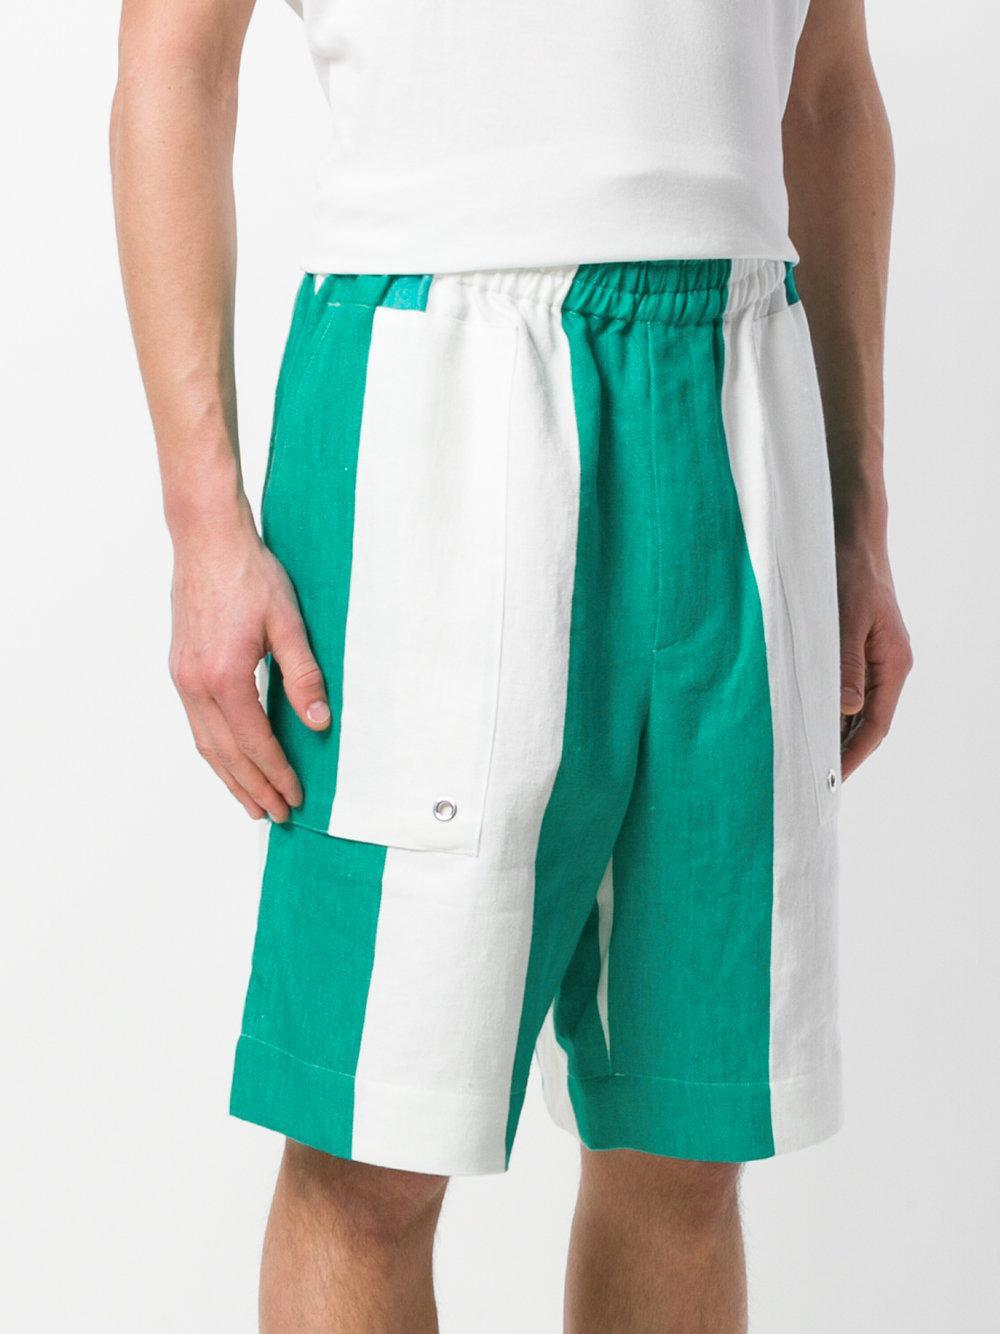 striped elasticated waist shorts - White mnMmSqOYb8